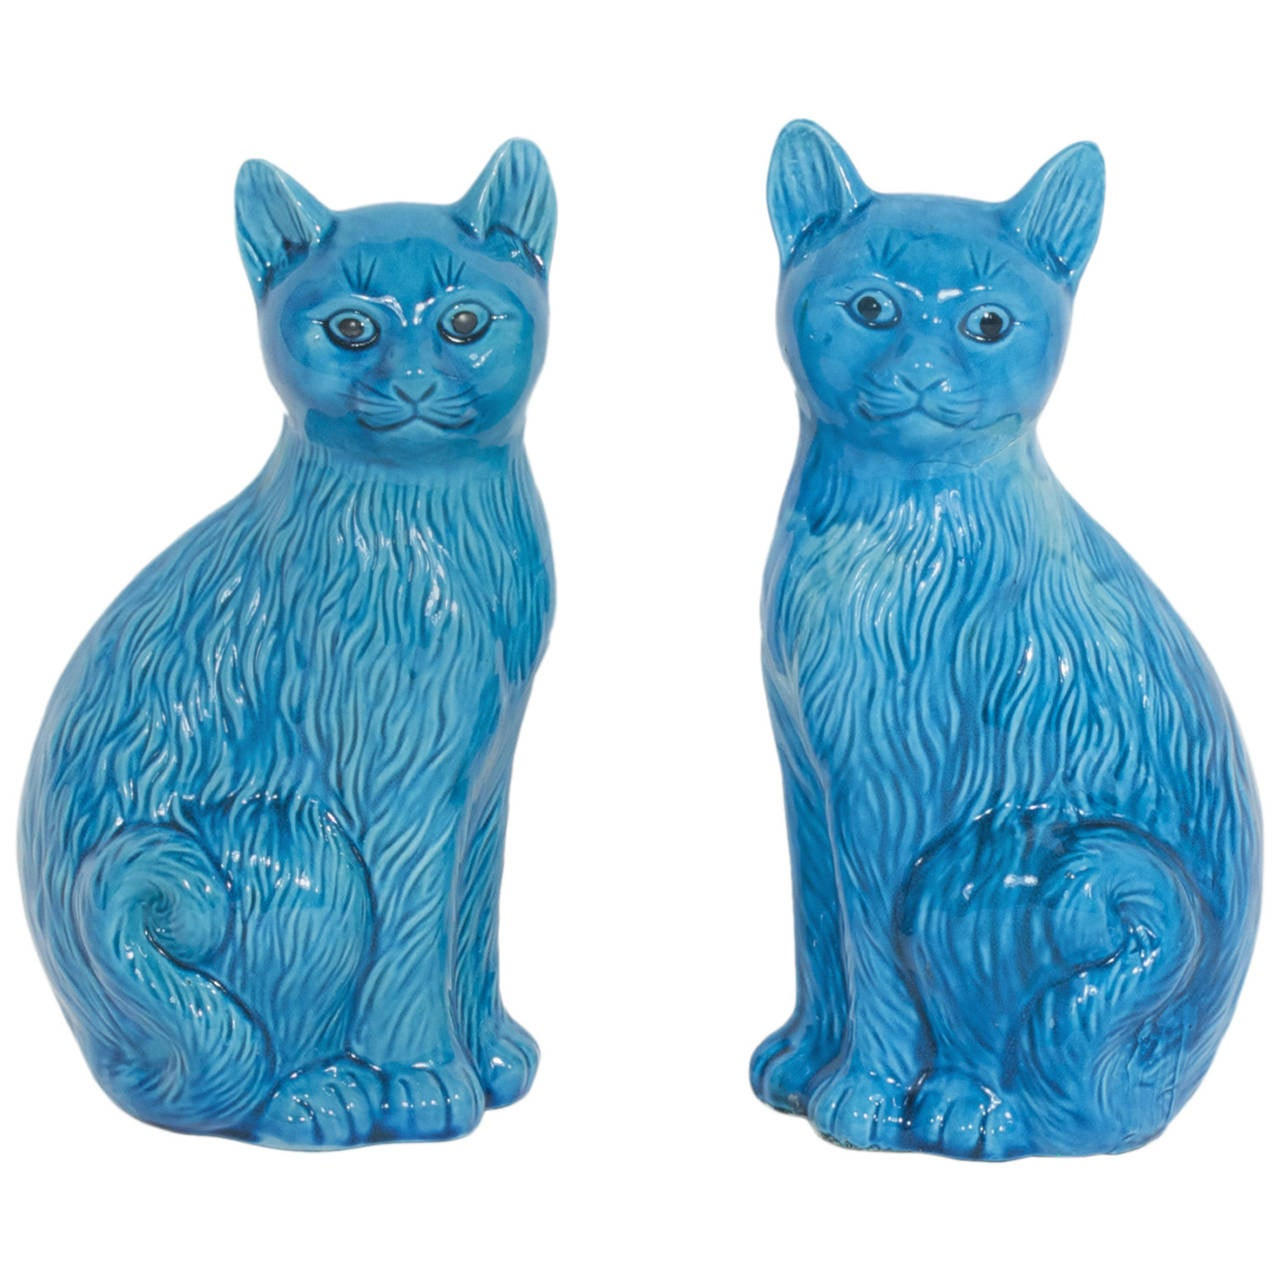 Large Pair of Ceramic Turquoise Blue Cats